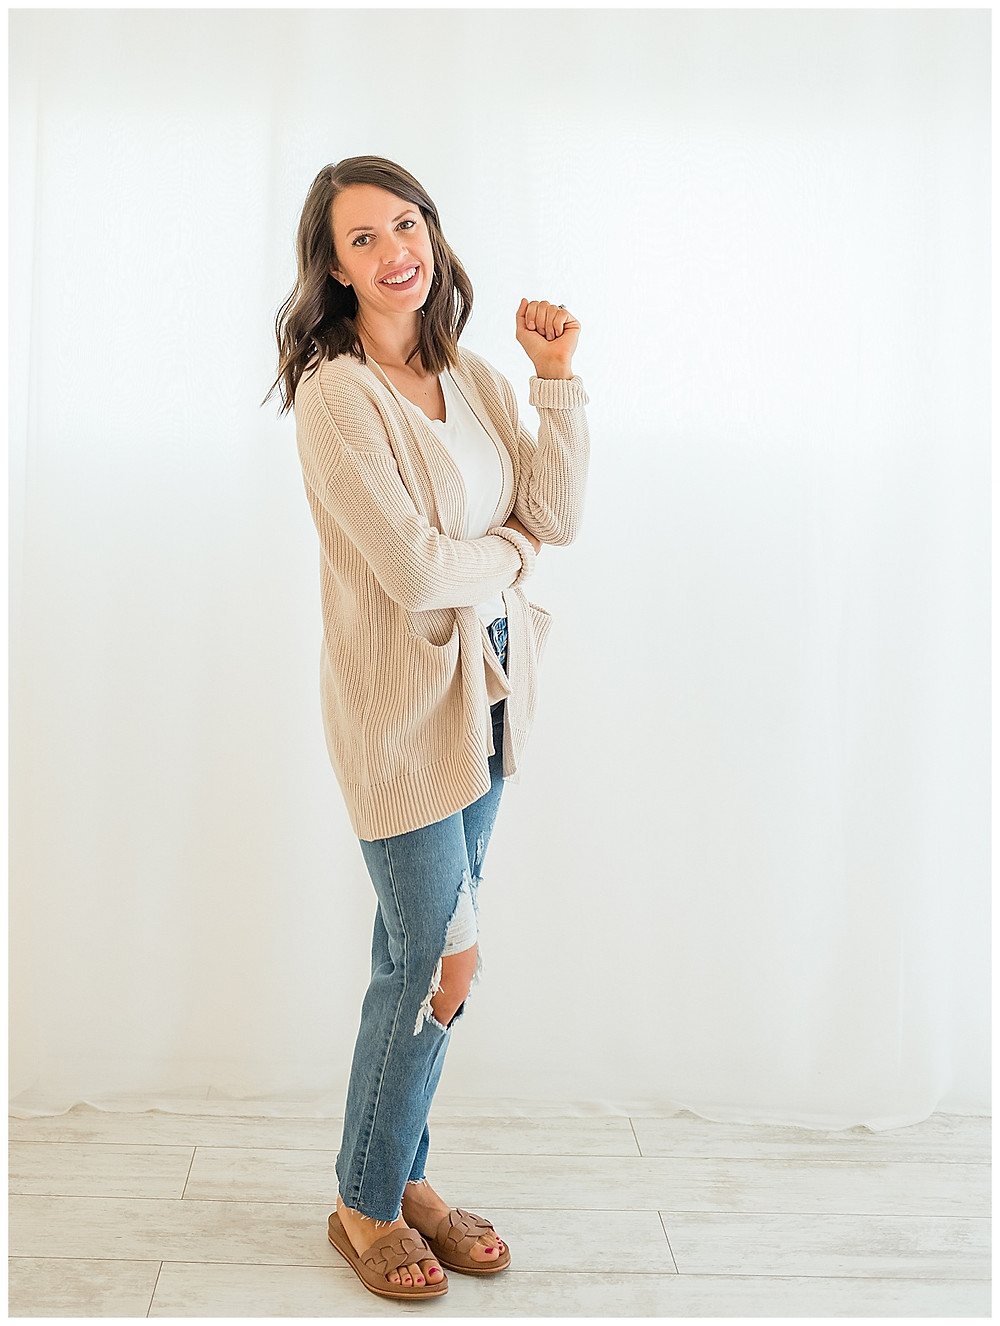 Style, Fashion, Blogger, Southern Utah, Photographer, White Studio, Cedar City, Target Style, Target, Shop, Stores, Affiliate